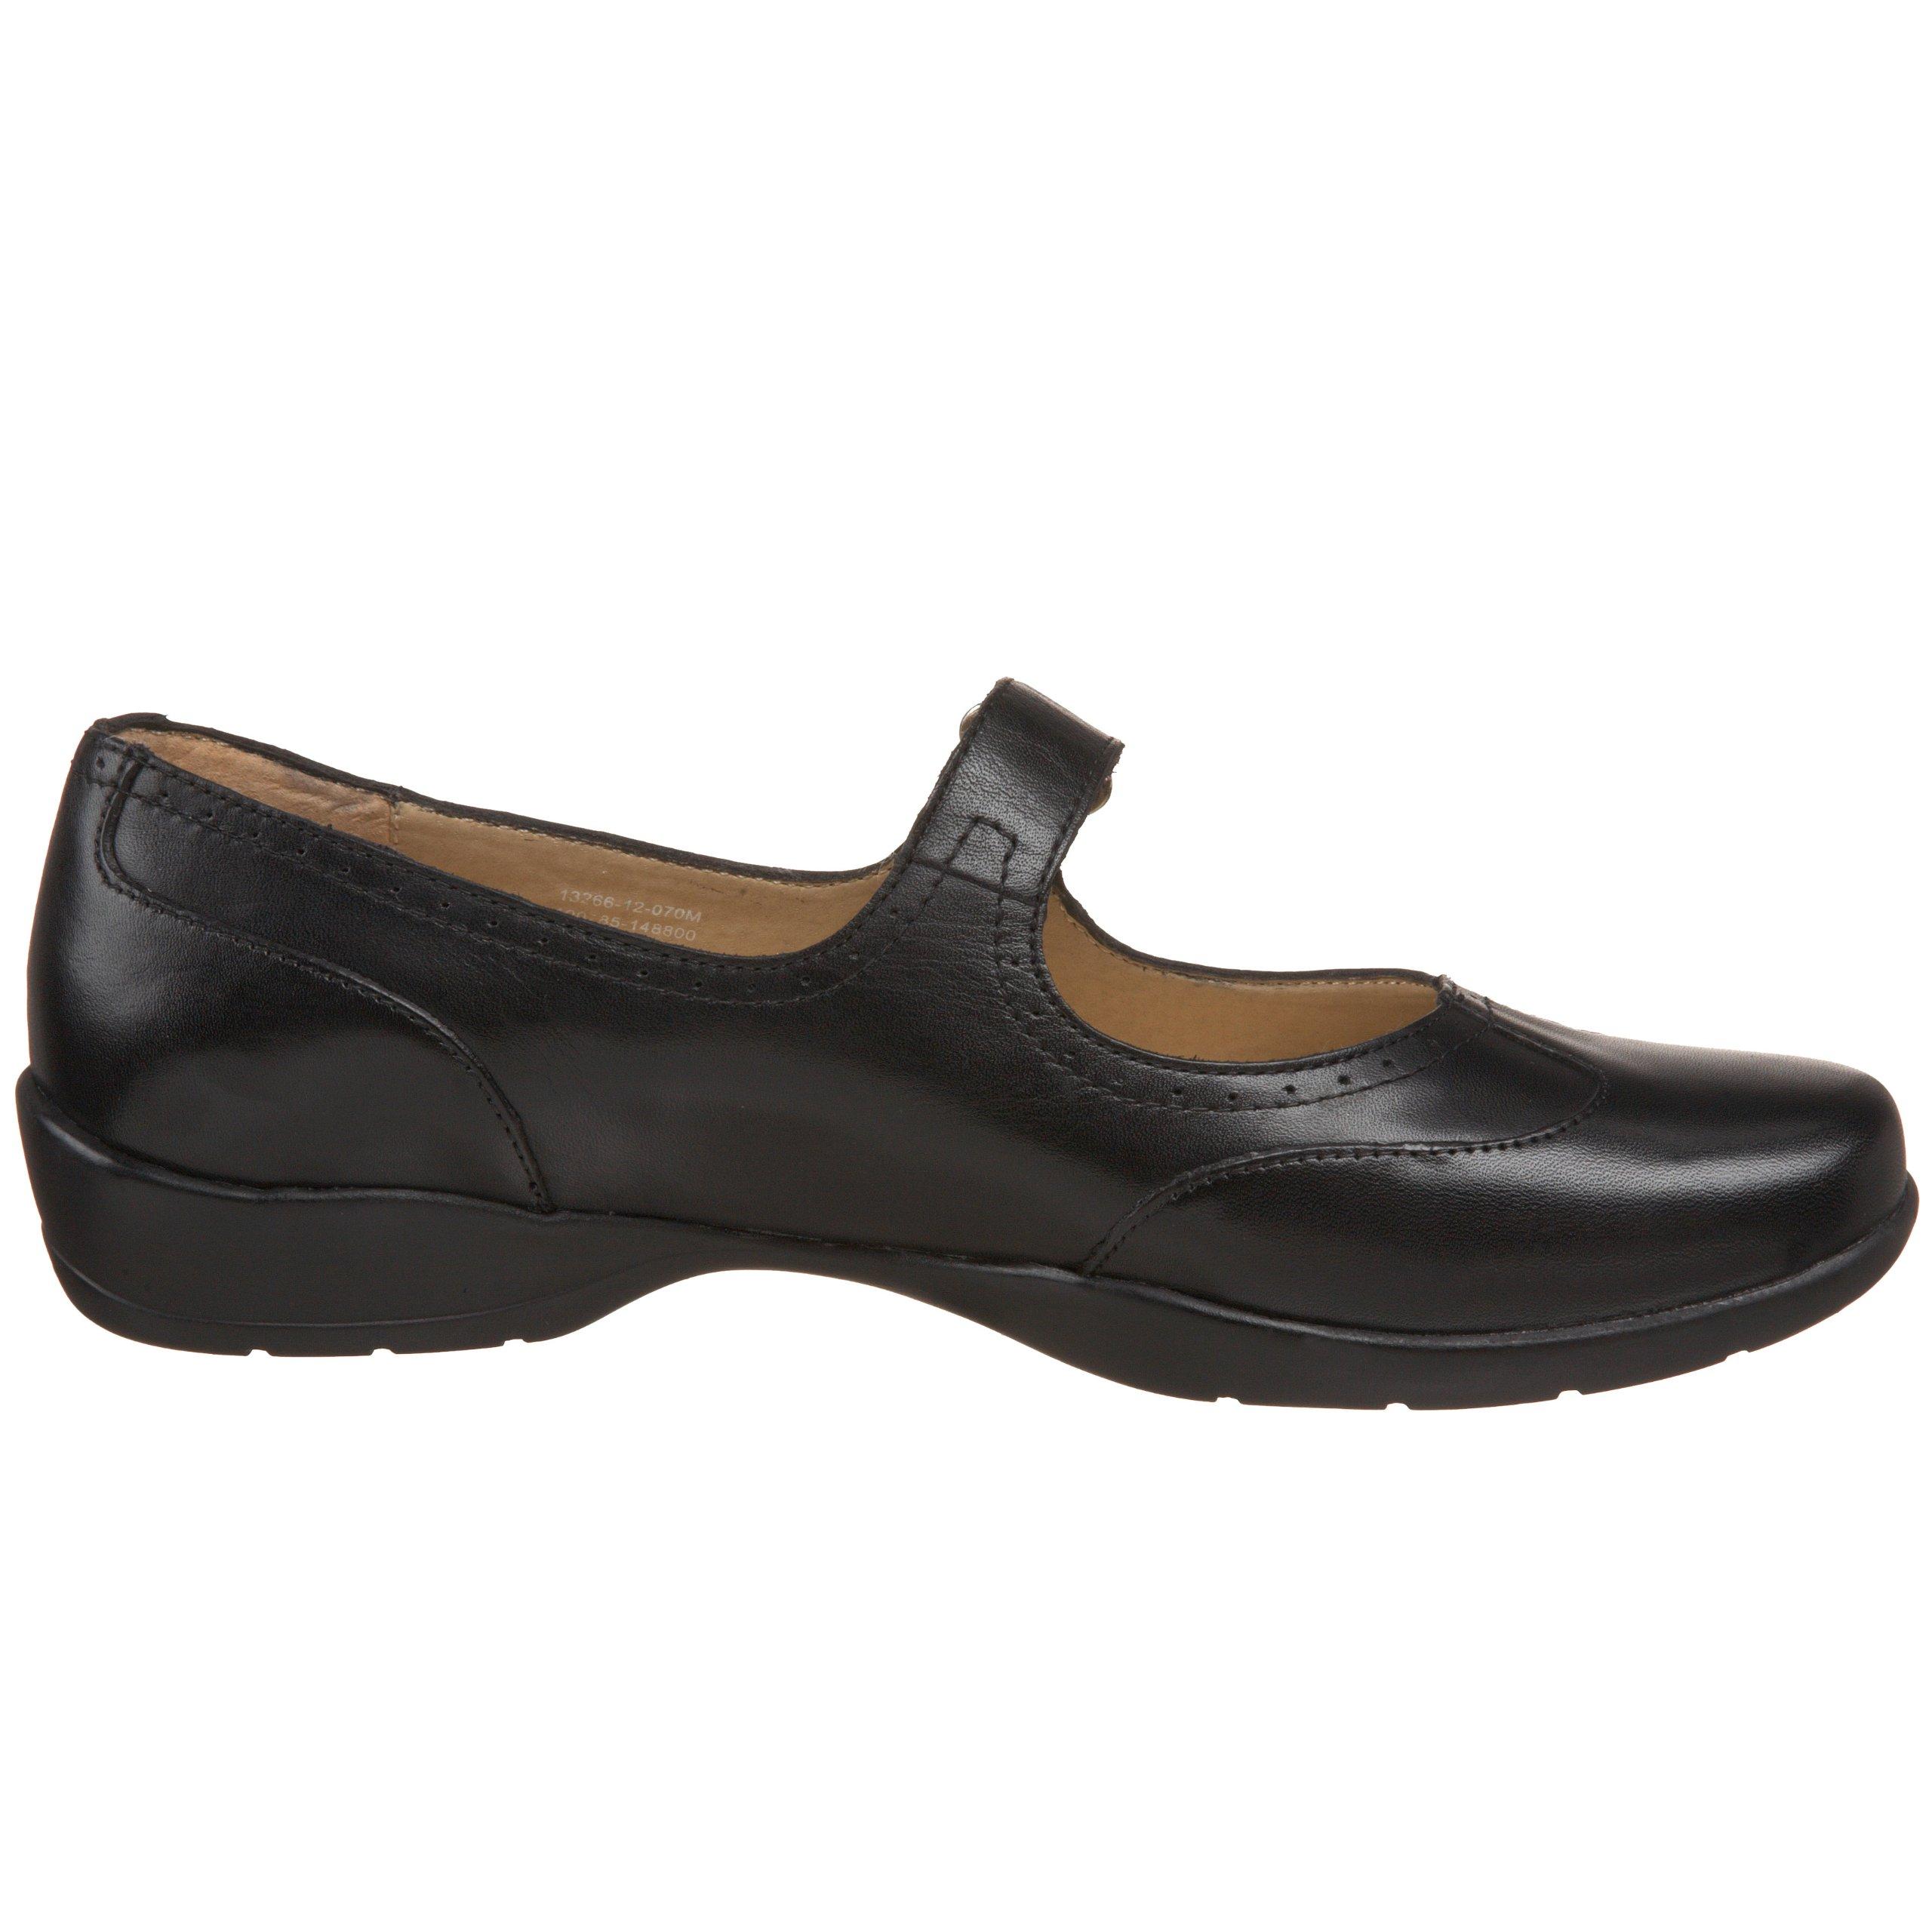 Drew Shoe Women's Isabel Mary Jane,Black Leather,6 W US by Drew Shoe (Image #6)